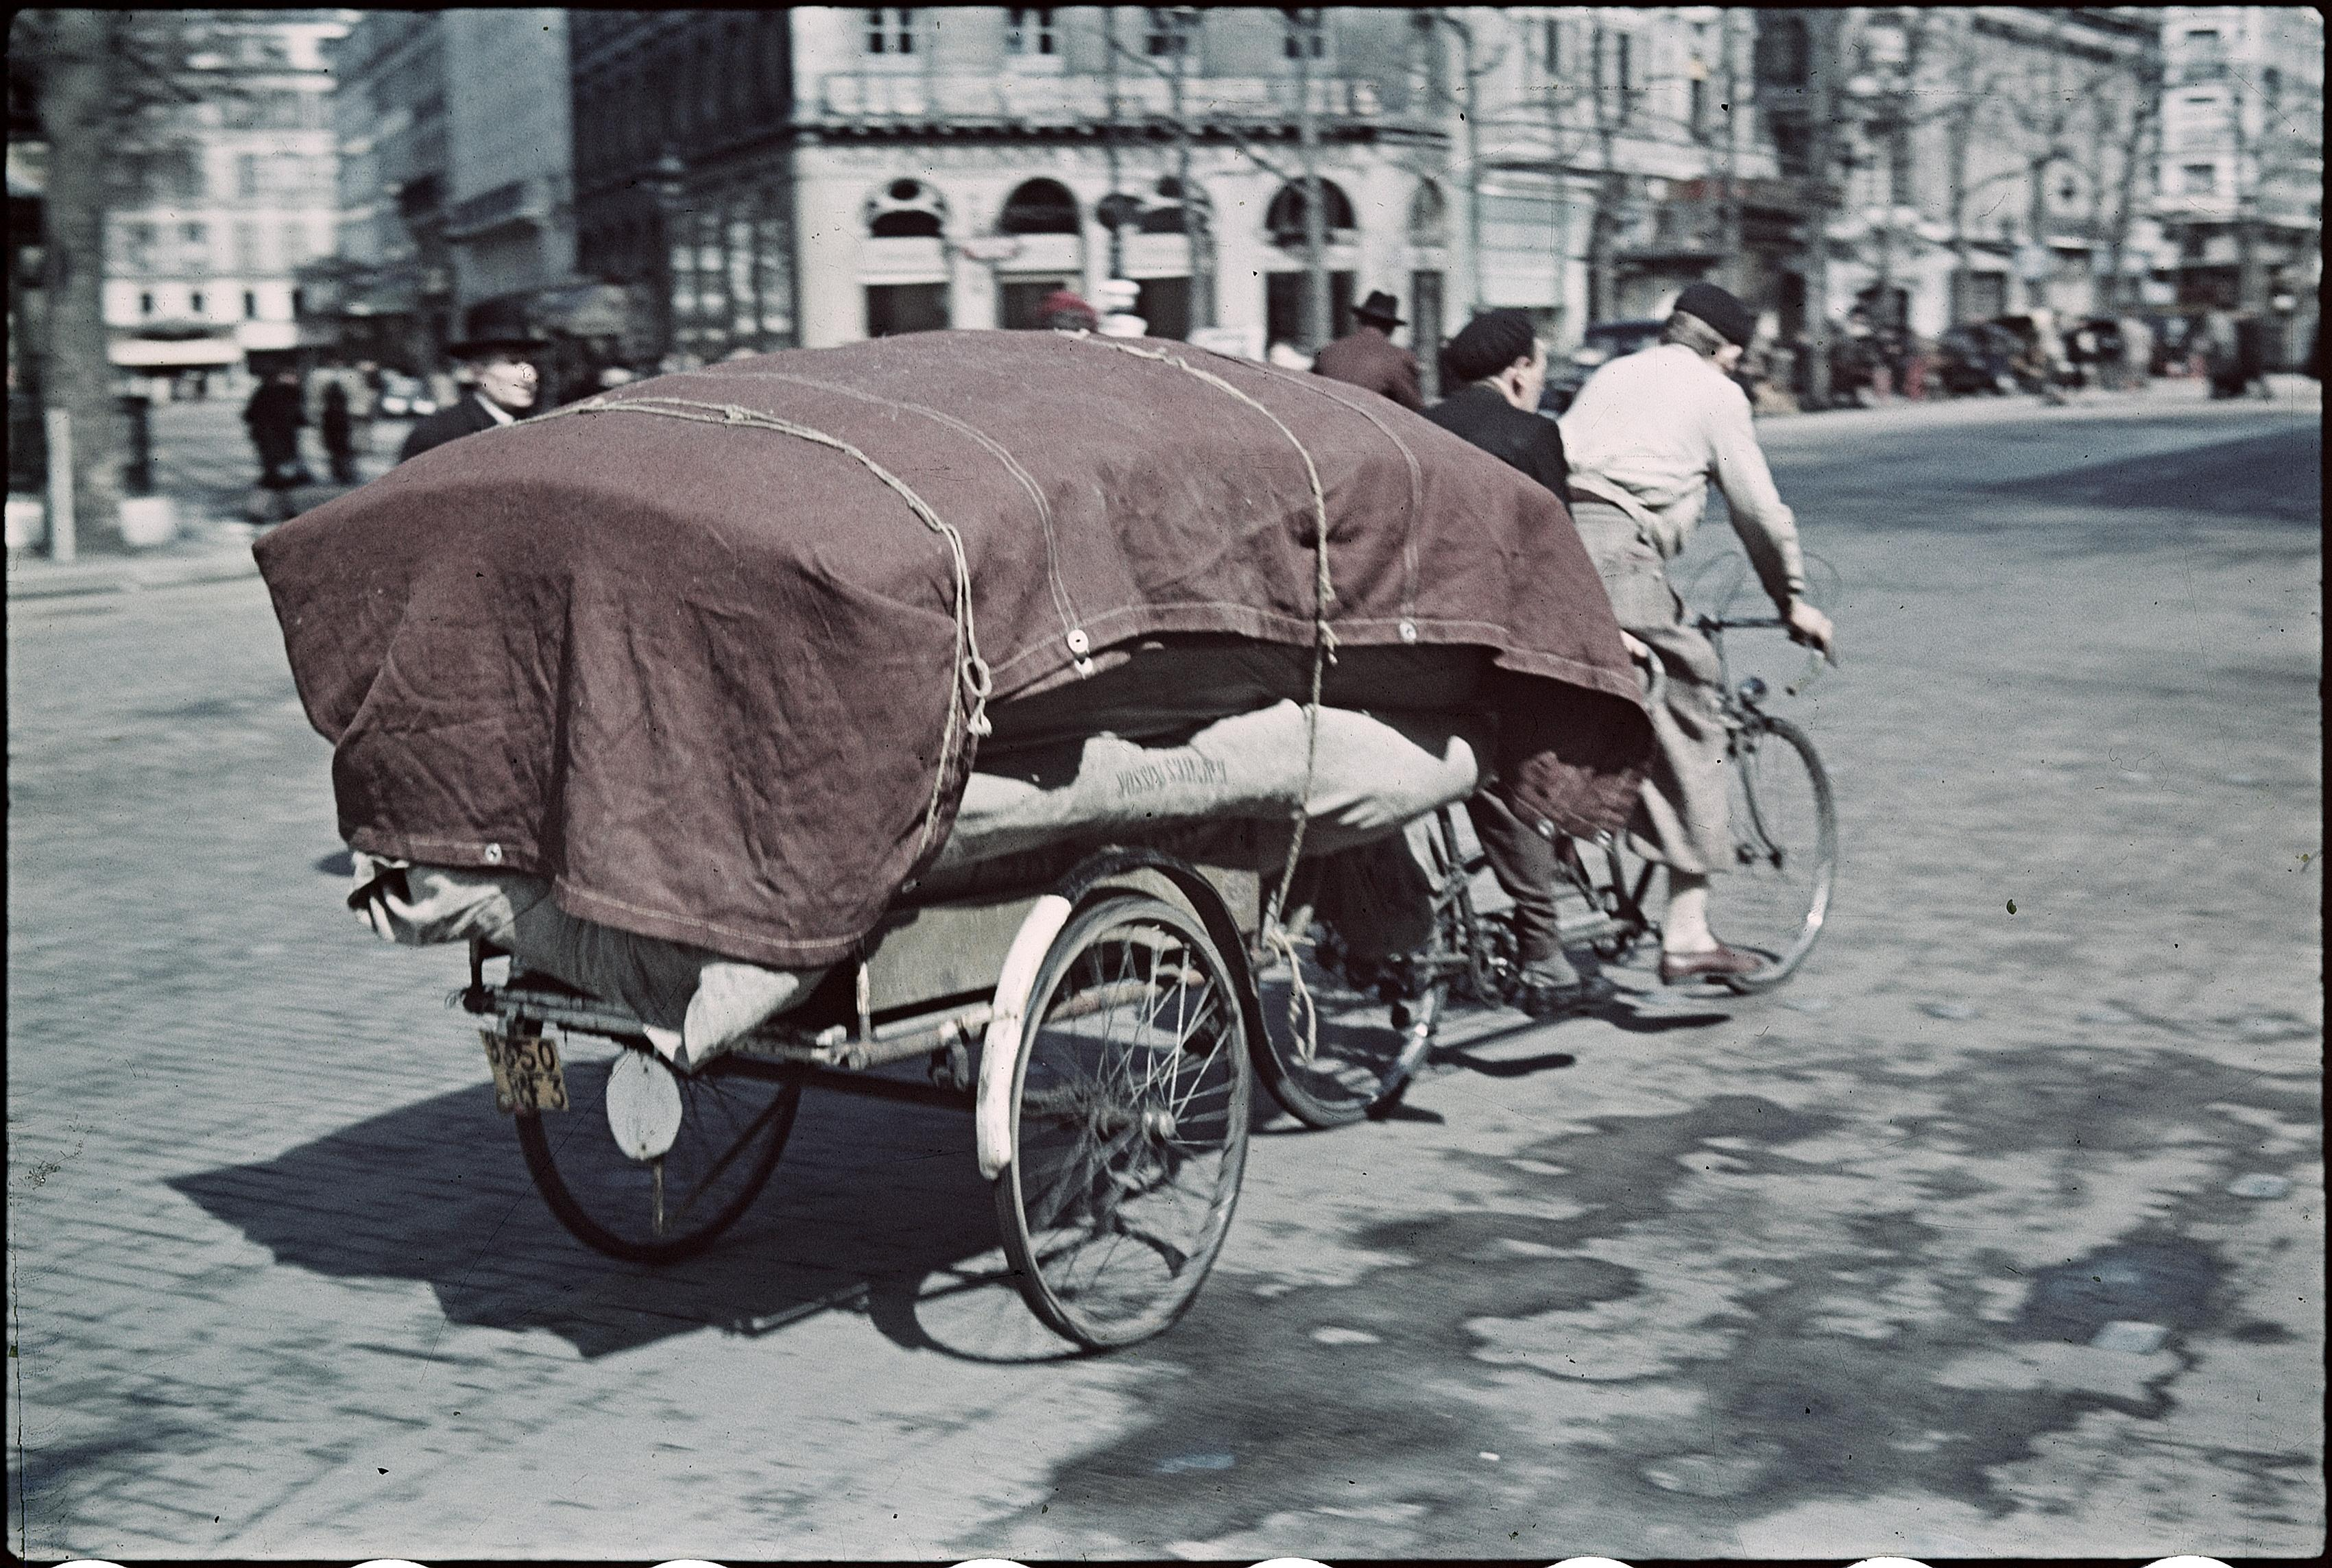 Доставка велосипедов на бульваре Мадлен